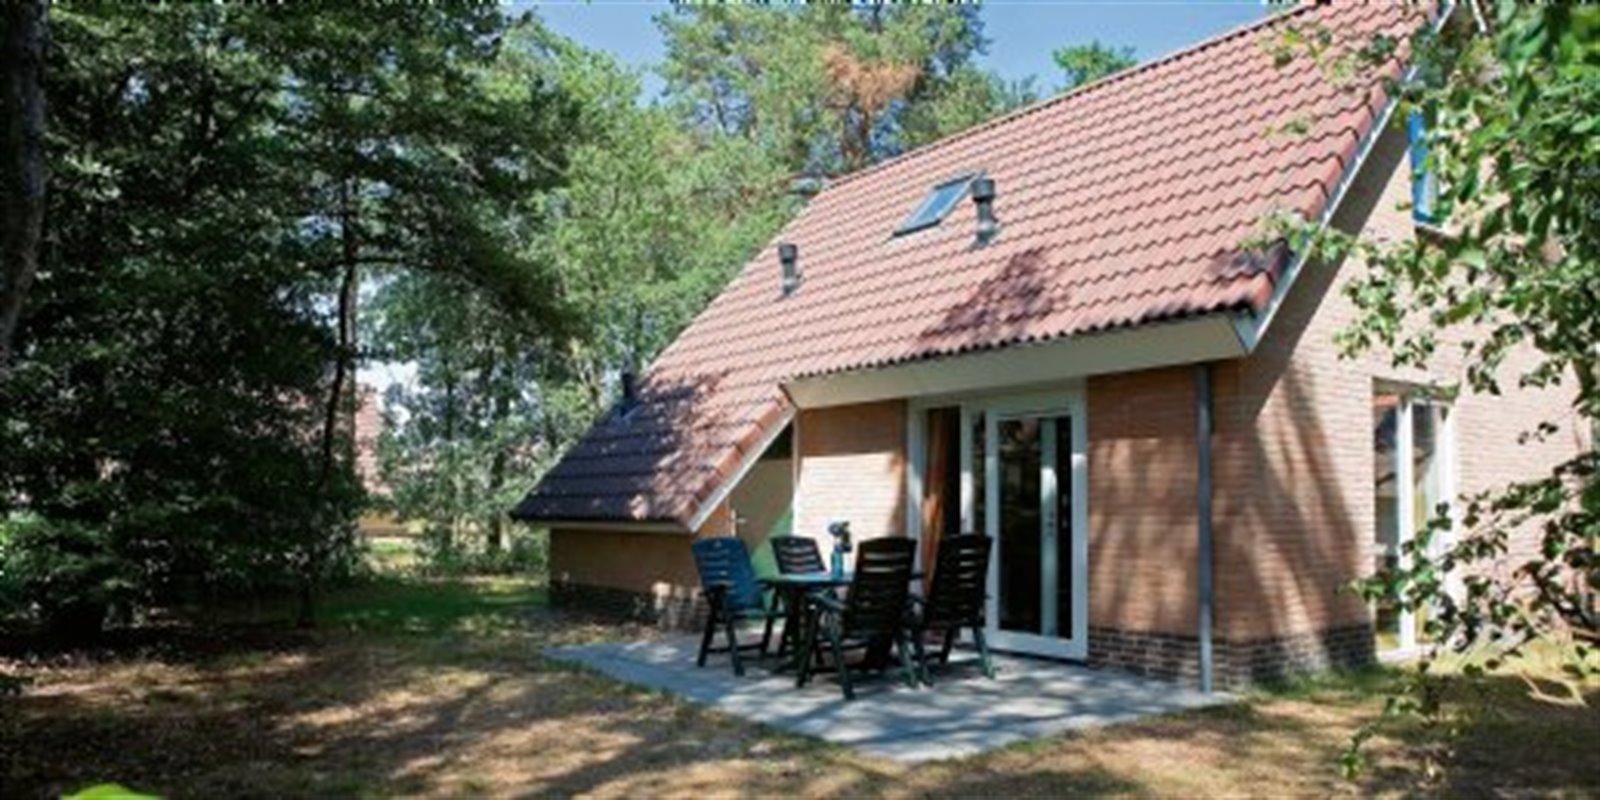 Landal Twenhaarsveld   4-Pers.-Ferienhaus - Lux...